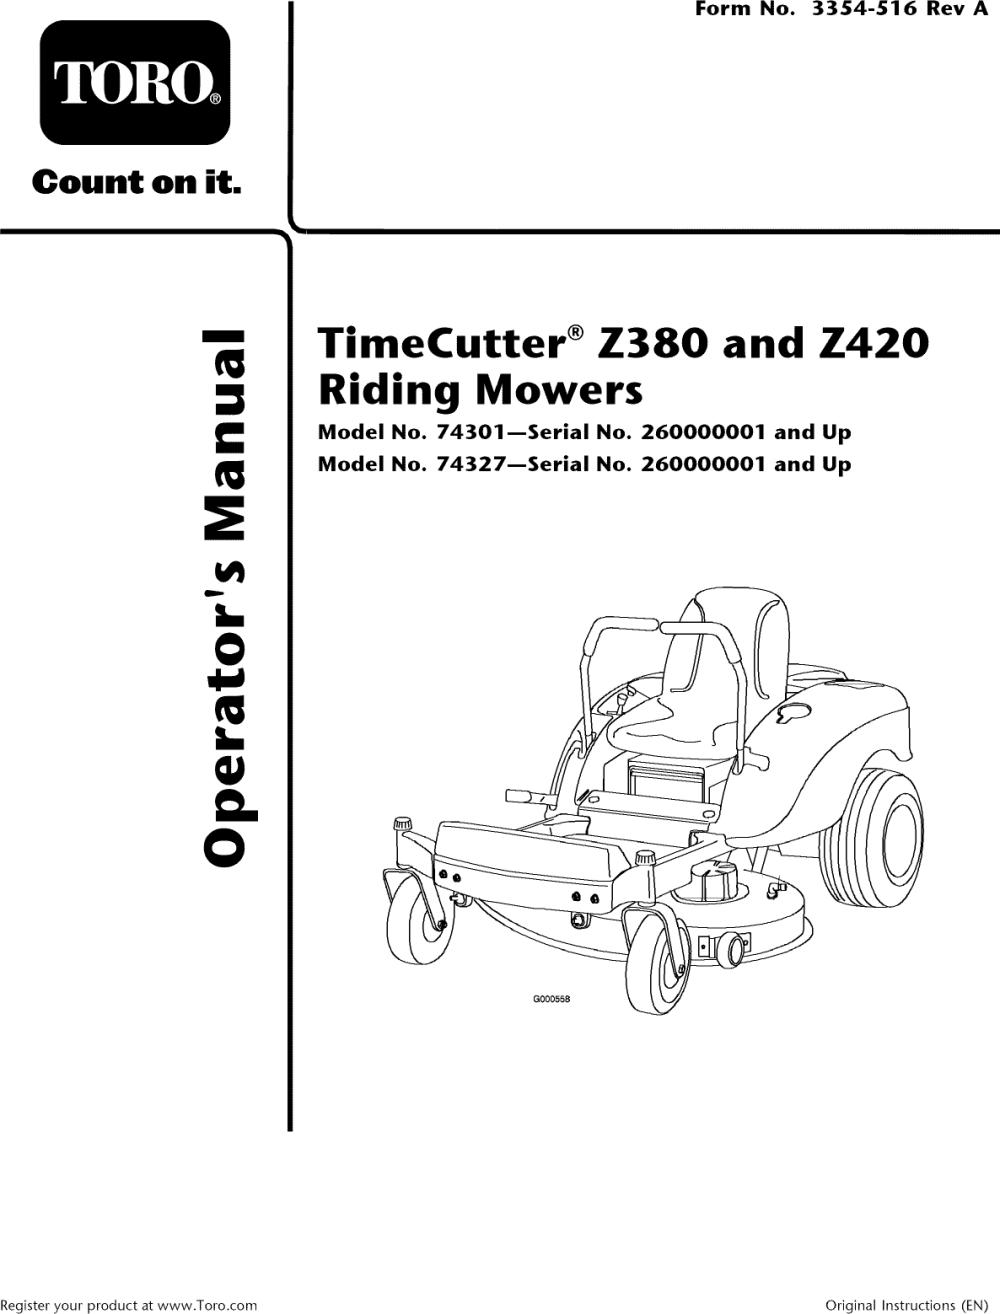 medium resolution of full size in new window array toro 74327 260000001 260019999 user manual riding mower manuals rh usermanual wiki